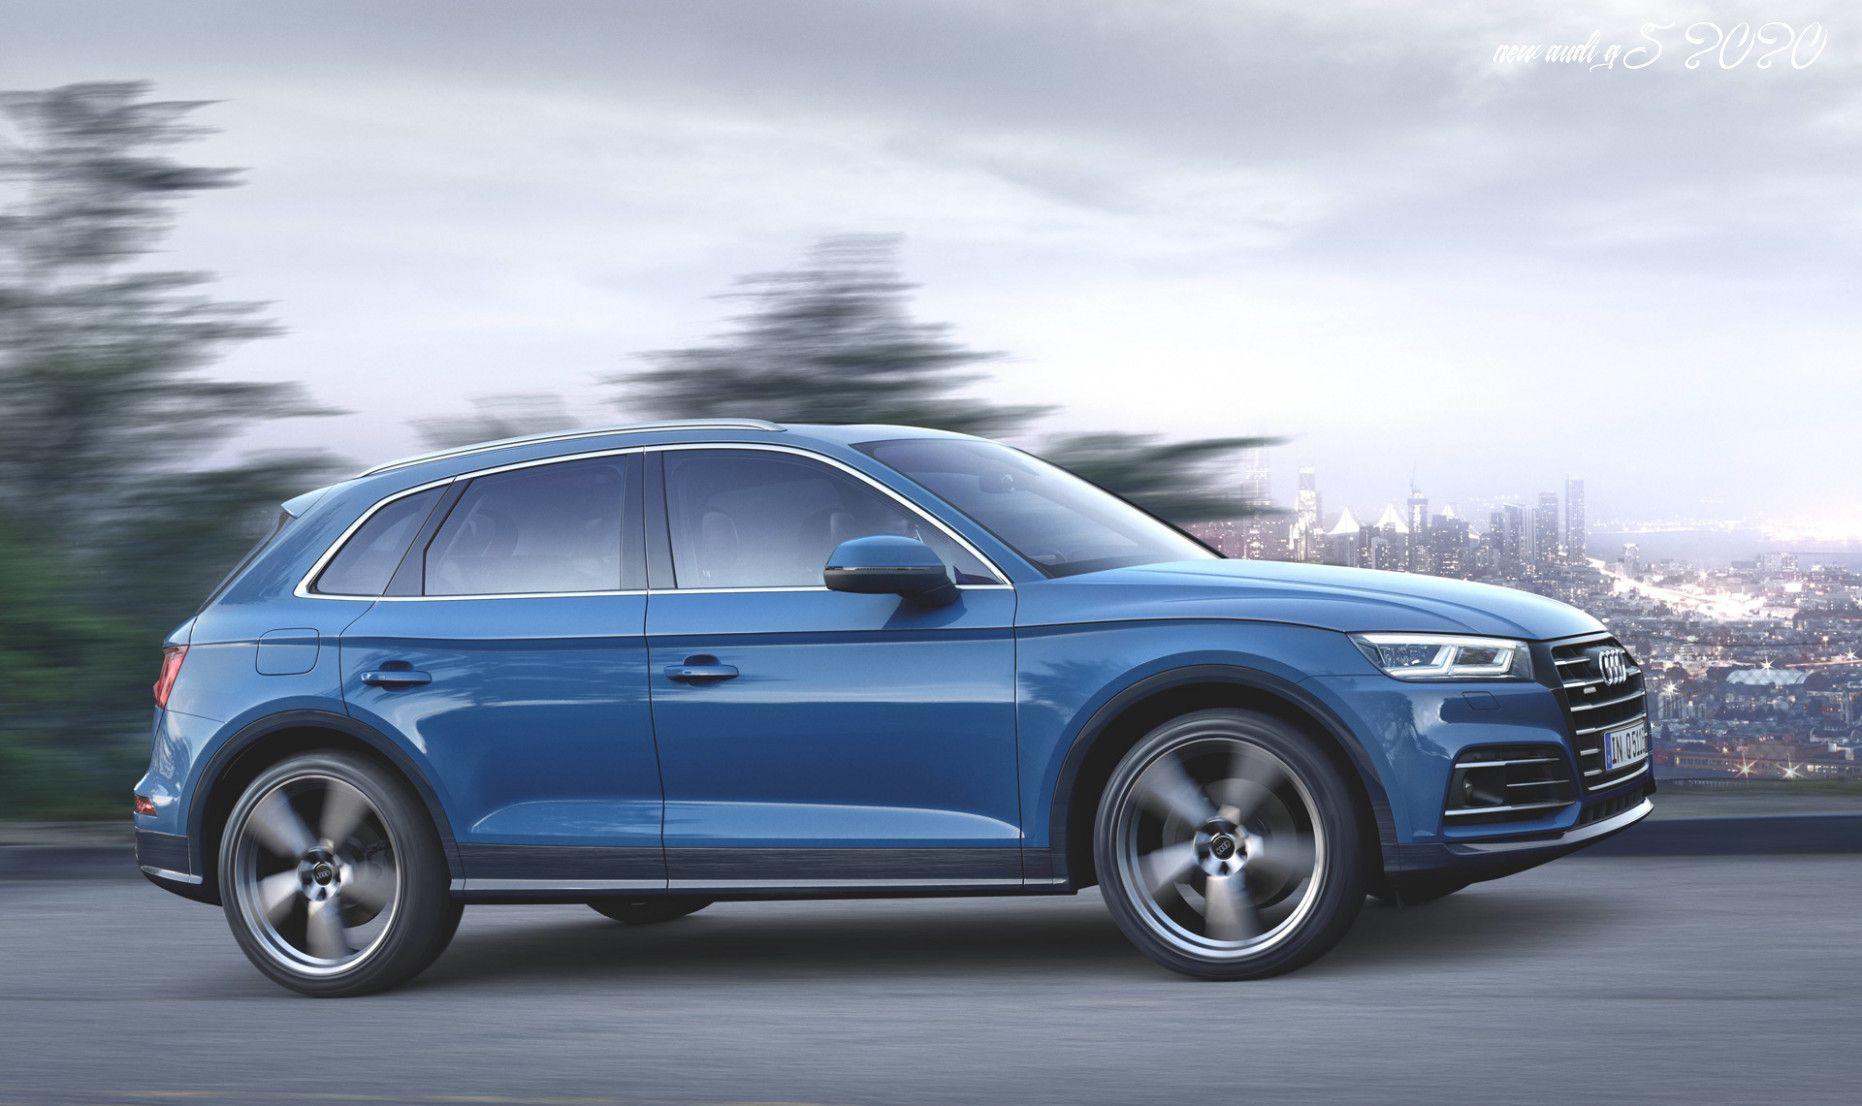 New Audi Q5 2020 Performance And New Engine In 2020 Audi Q5 Audi Car